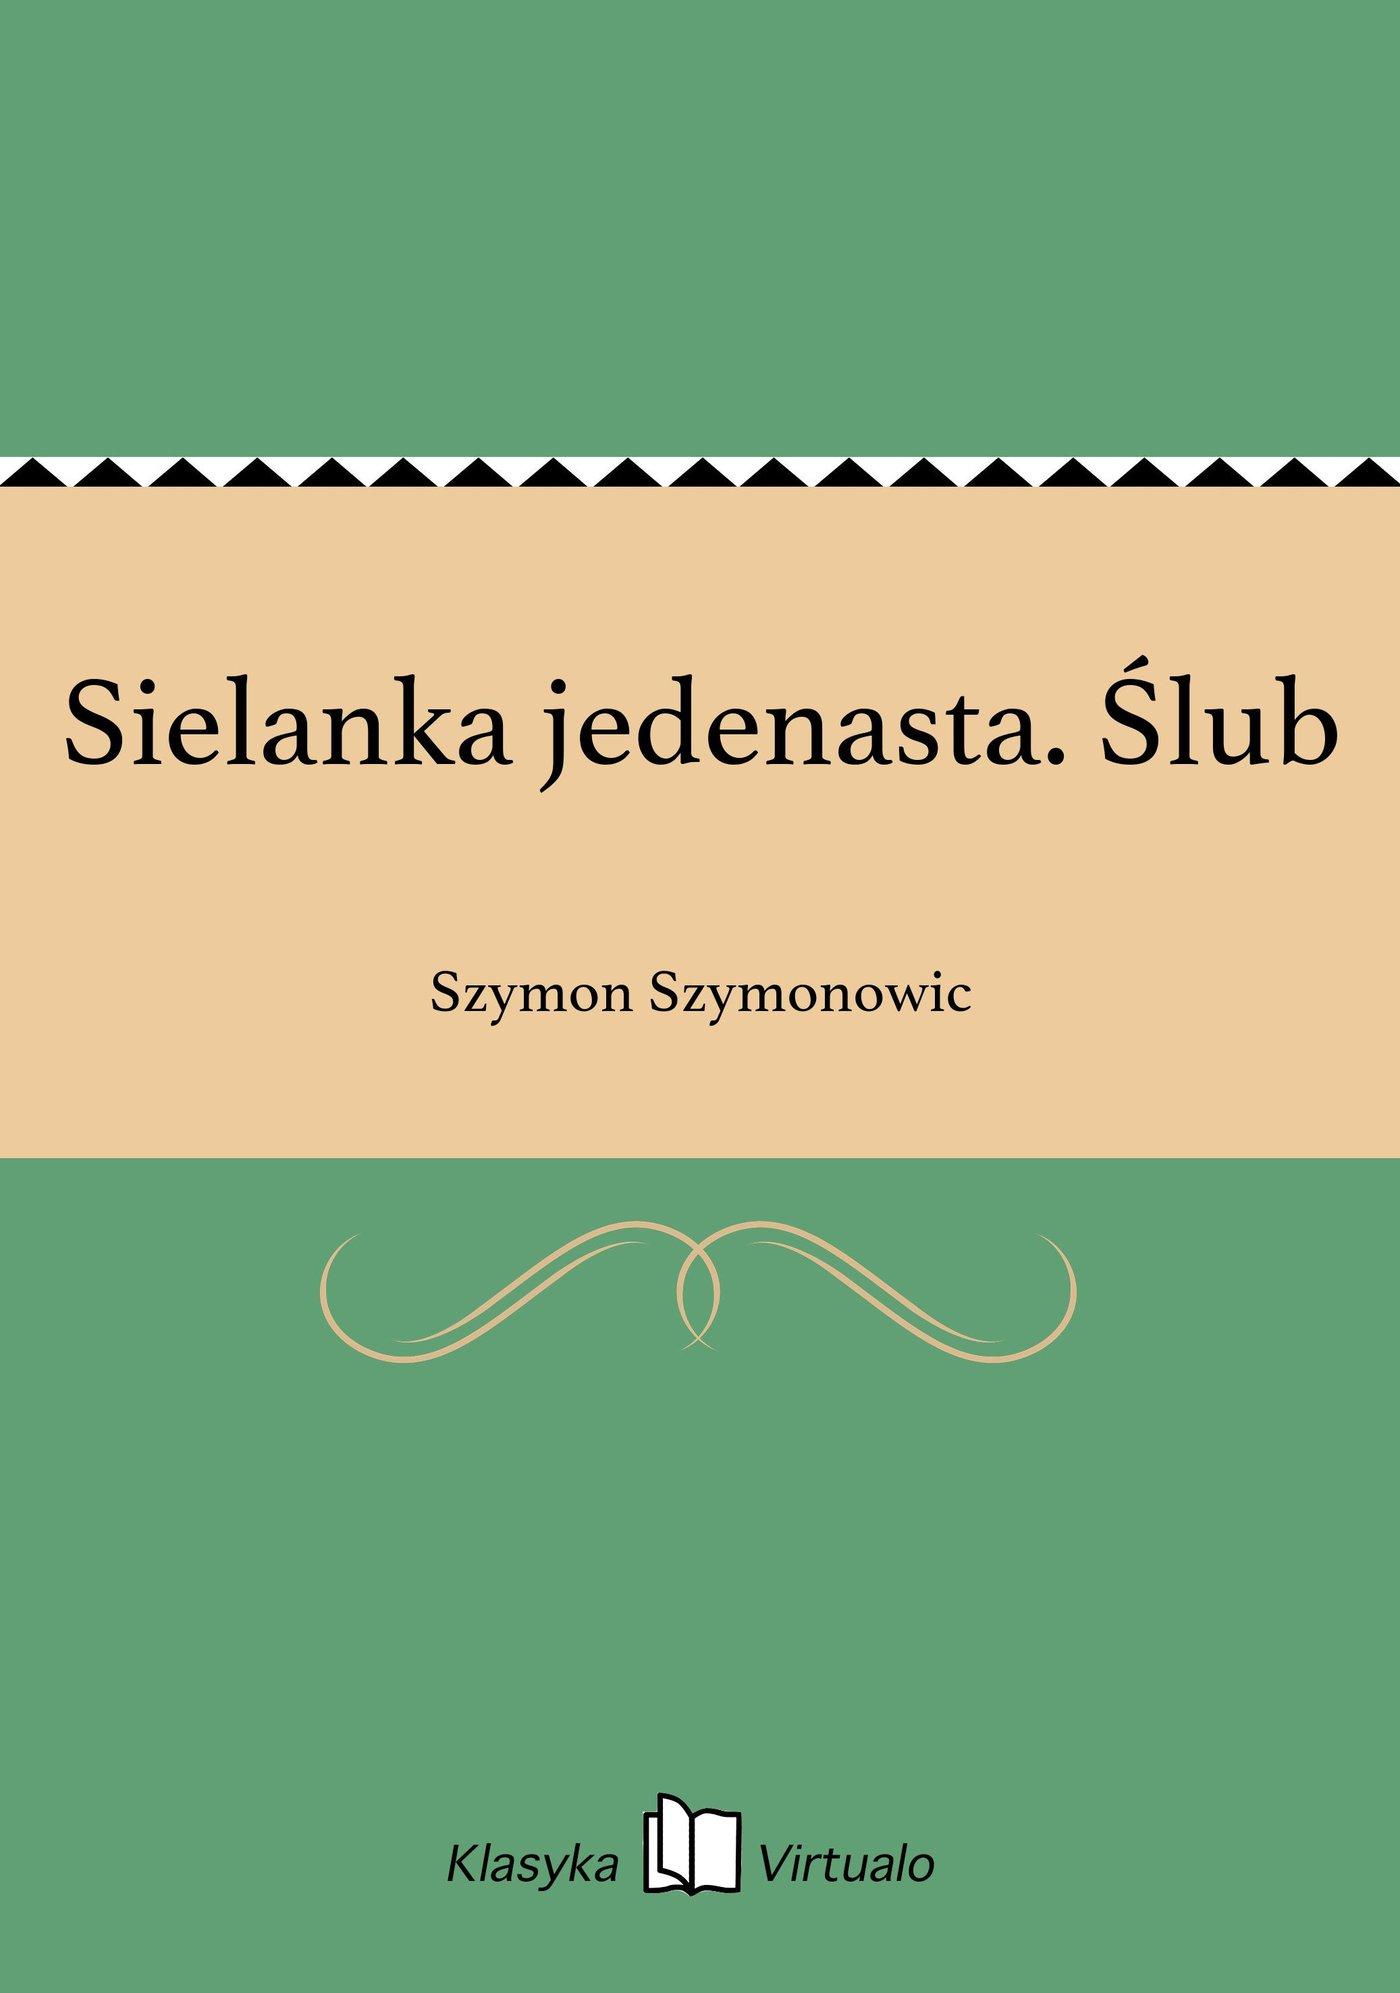 Sielanka jedenasta. Ślub - Ebook (Książka EPUB) do pobrania w formacie EPUB